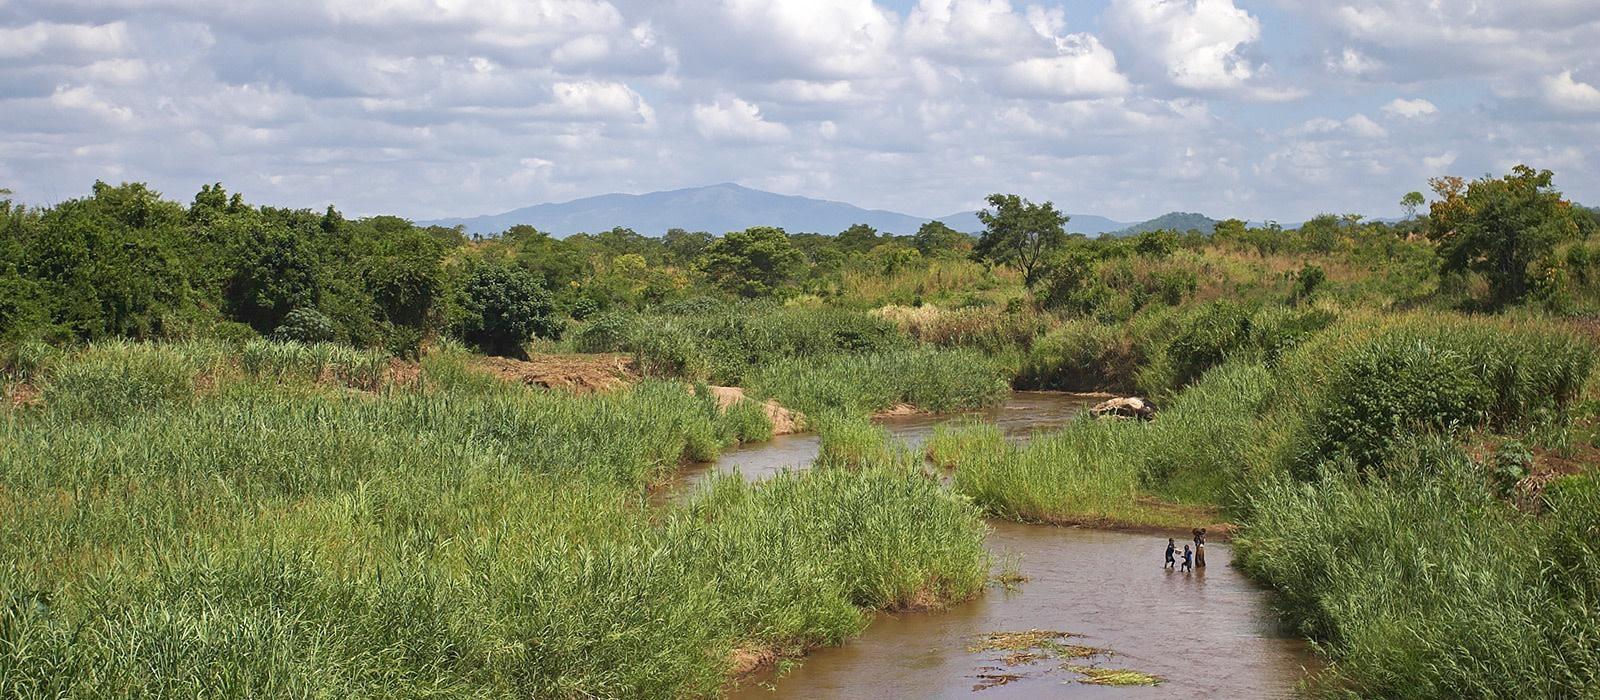 Reiseziel Liwonde Nationalpark Malawi